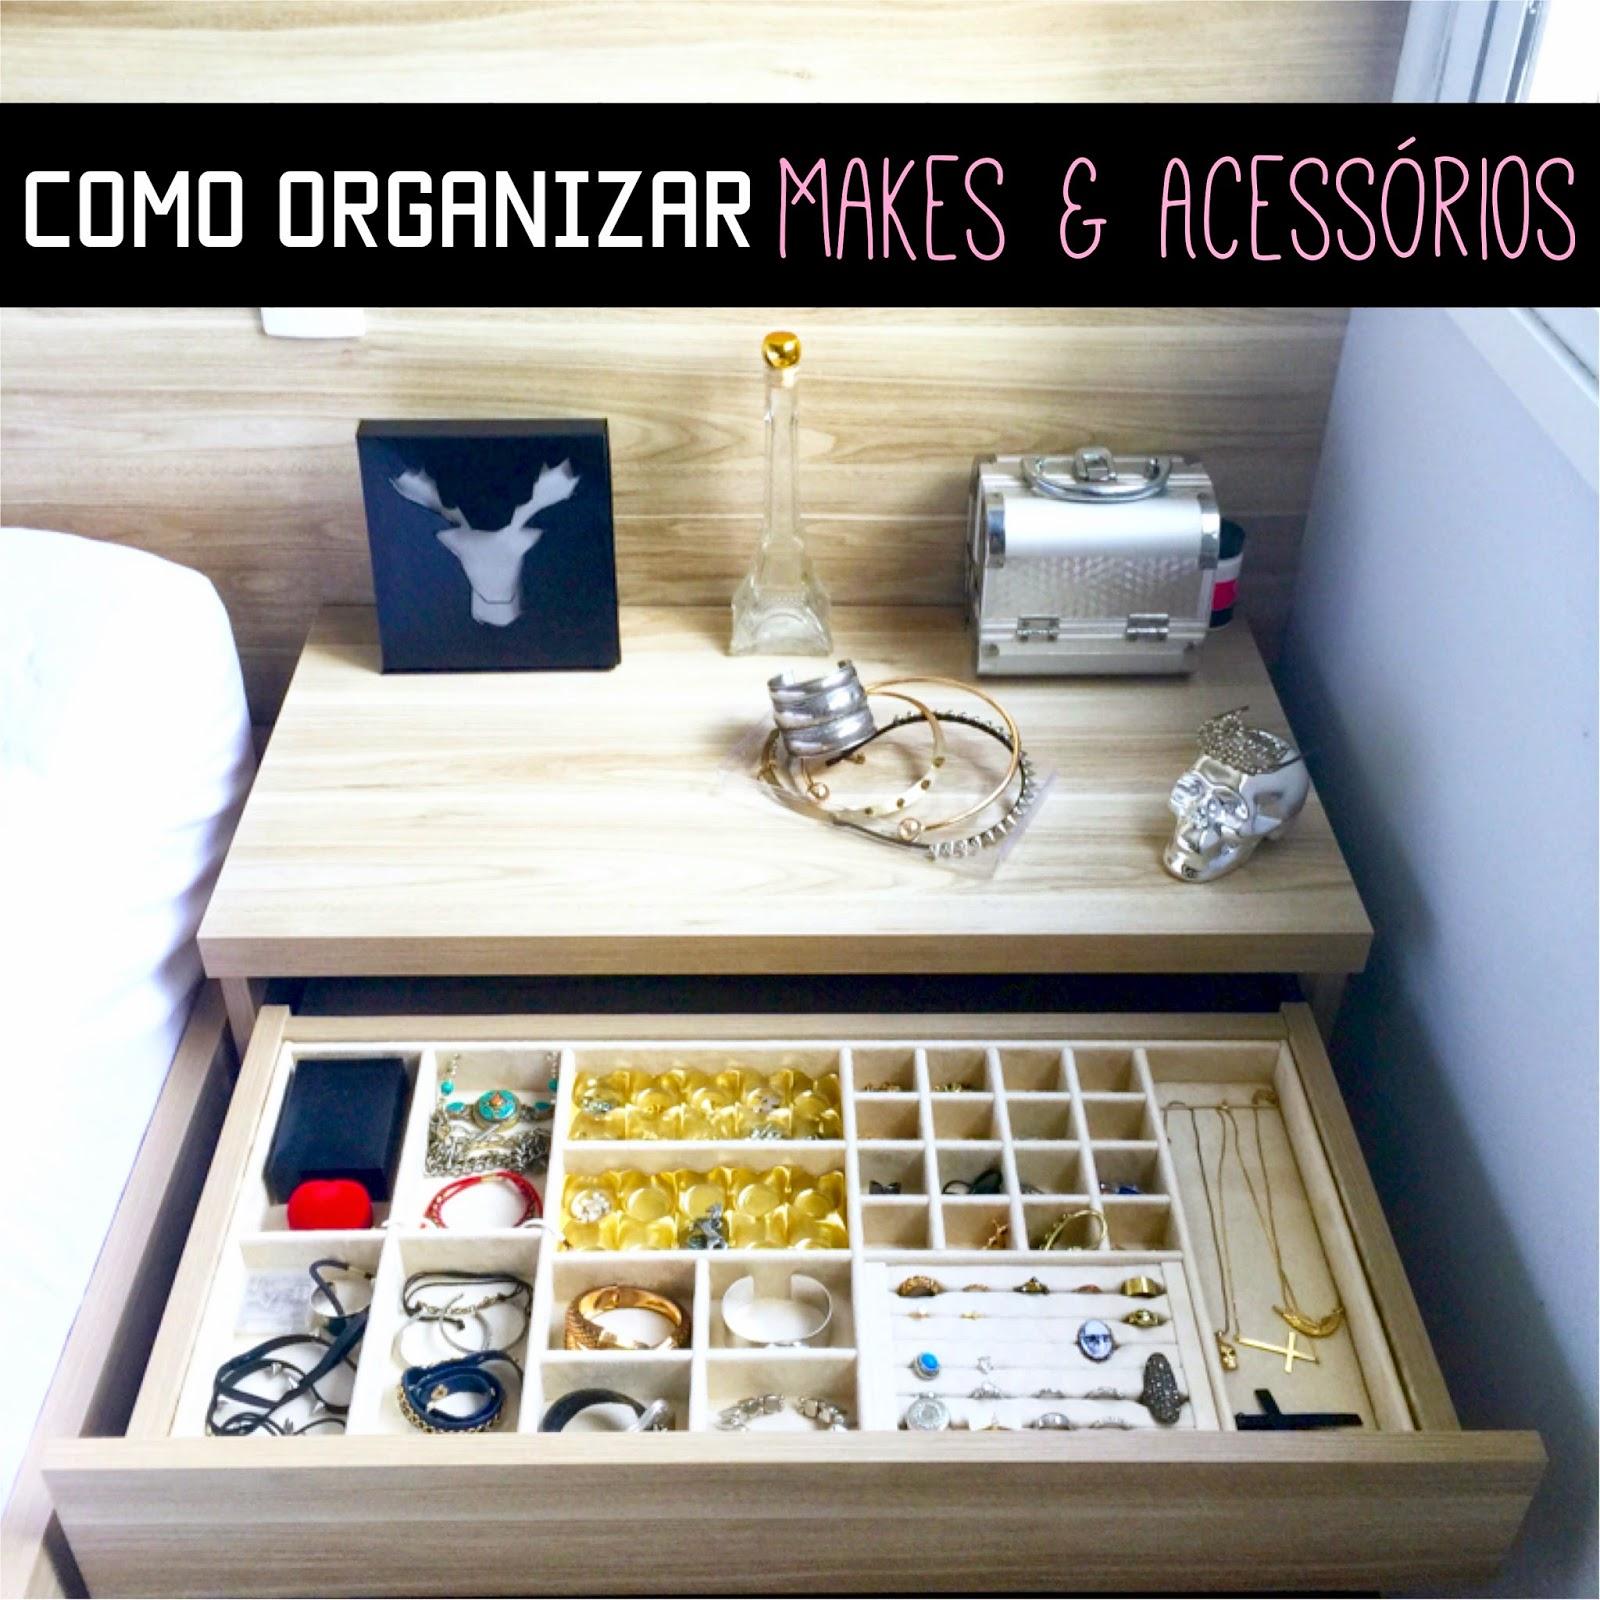 Como organizar makes e acessórios